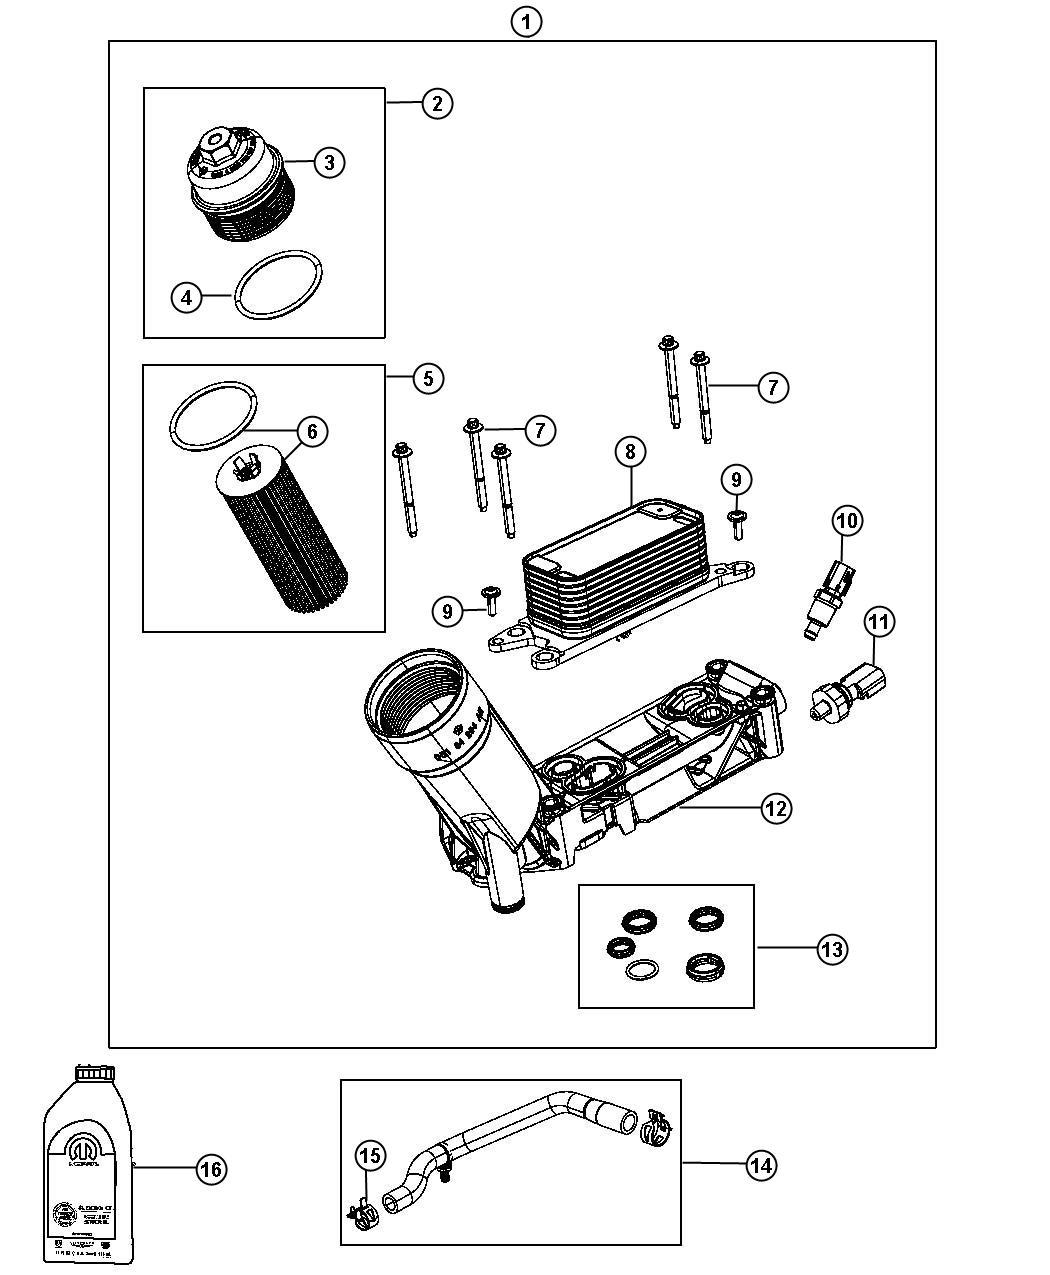 2016 dodge journey wiring diagram electric window motor 2007 grand caravan free